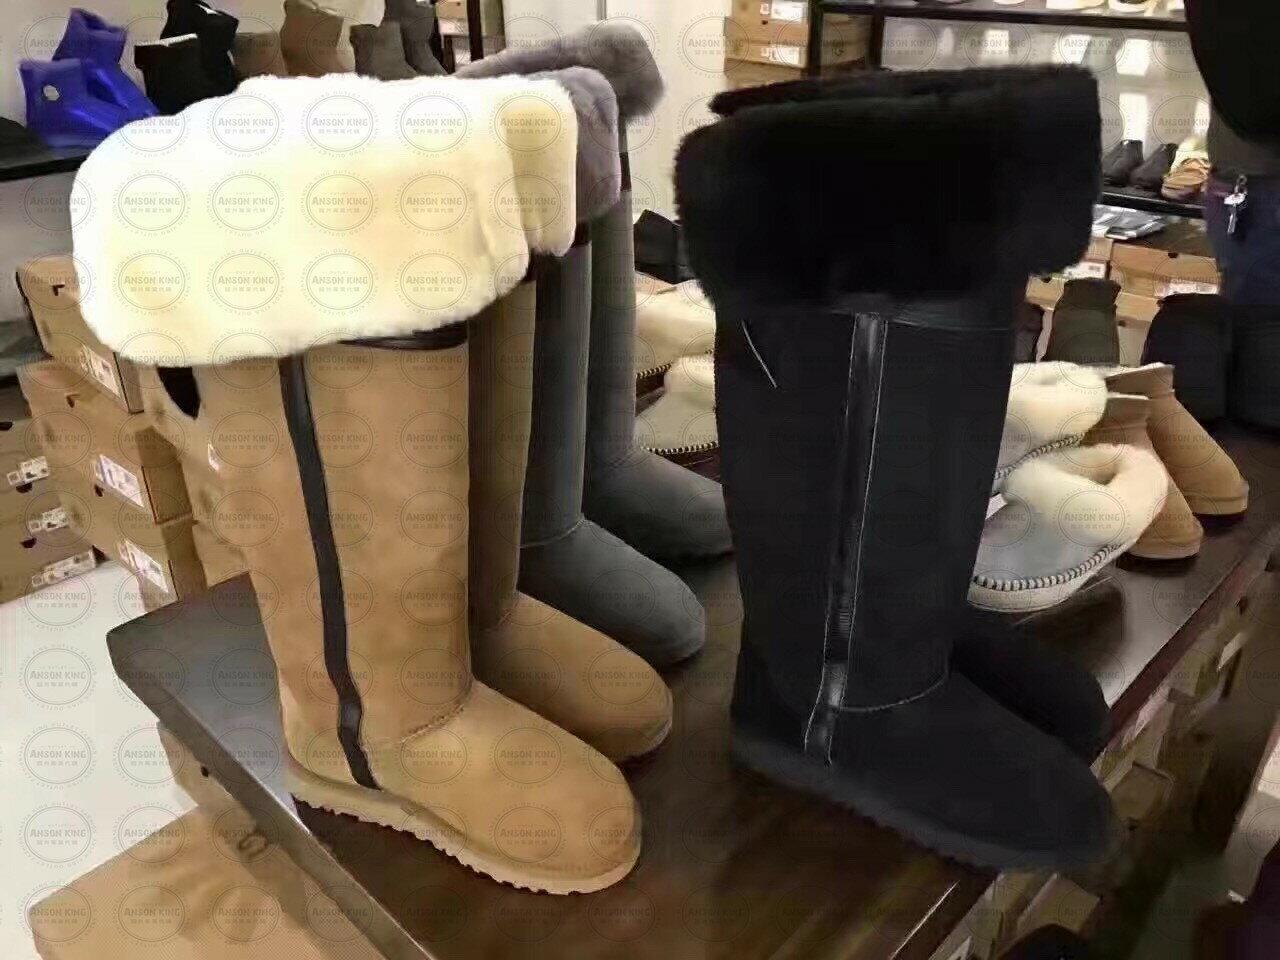 OUTLET正品代購 澳洲 UGG 千頌伊同款過膝羊皮毛雪靴 保暖 真皮羊皮毛 雪靴 短靴 黑色 3